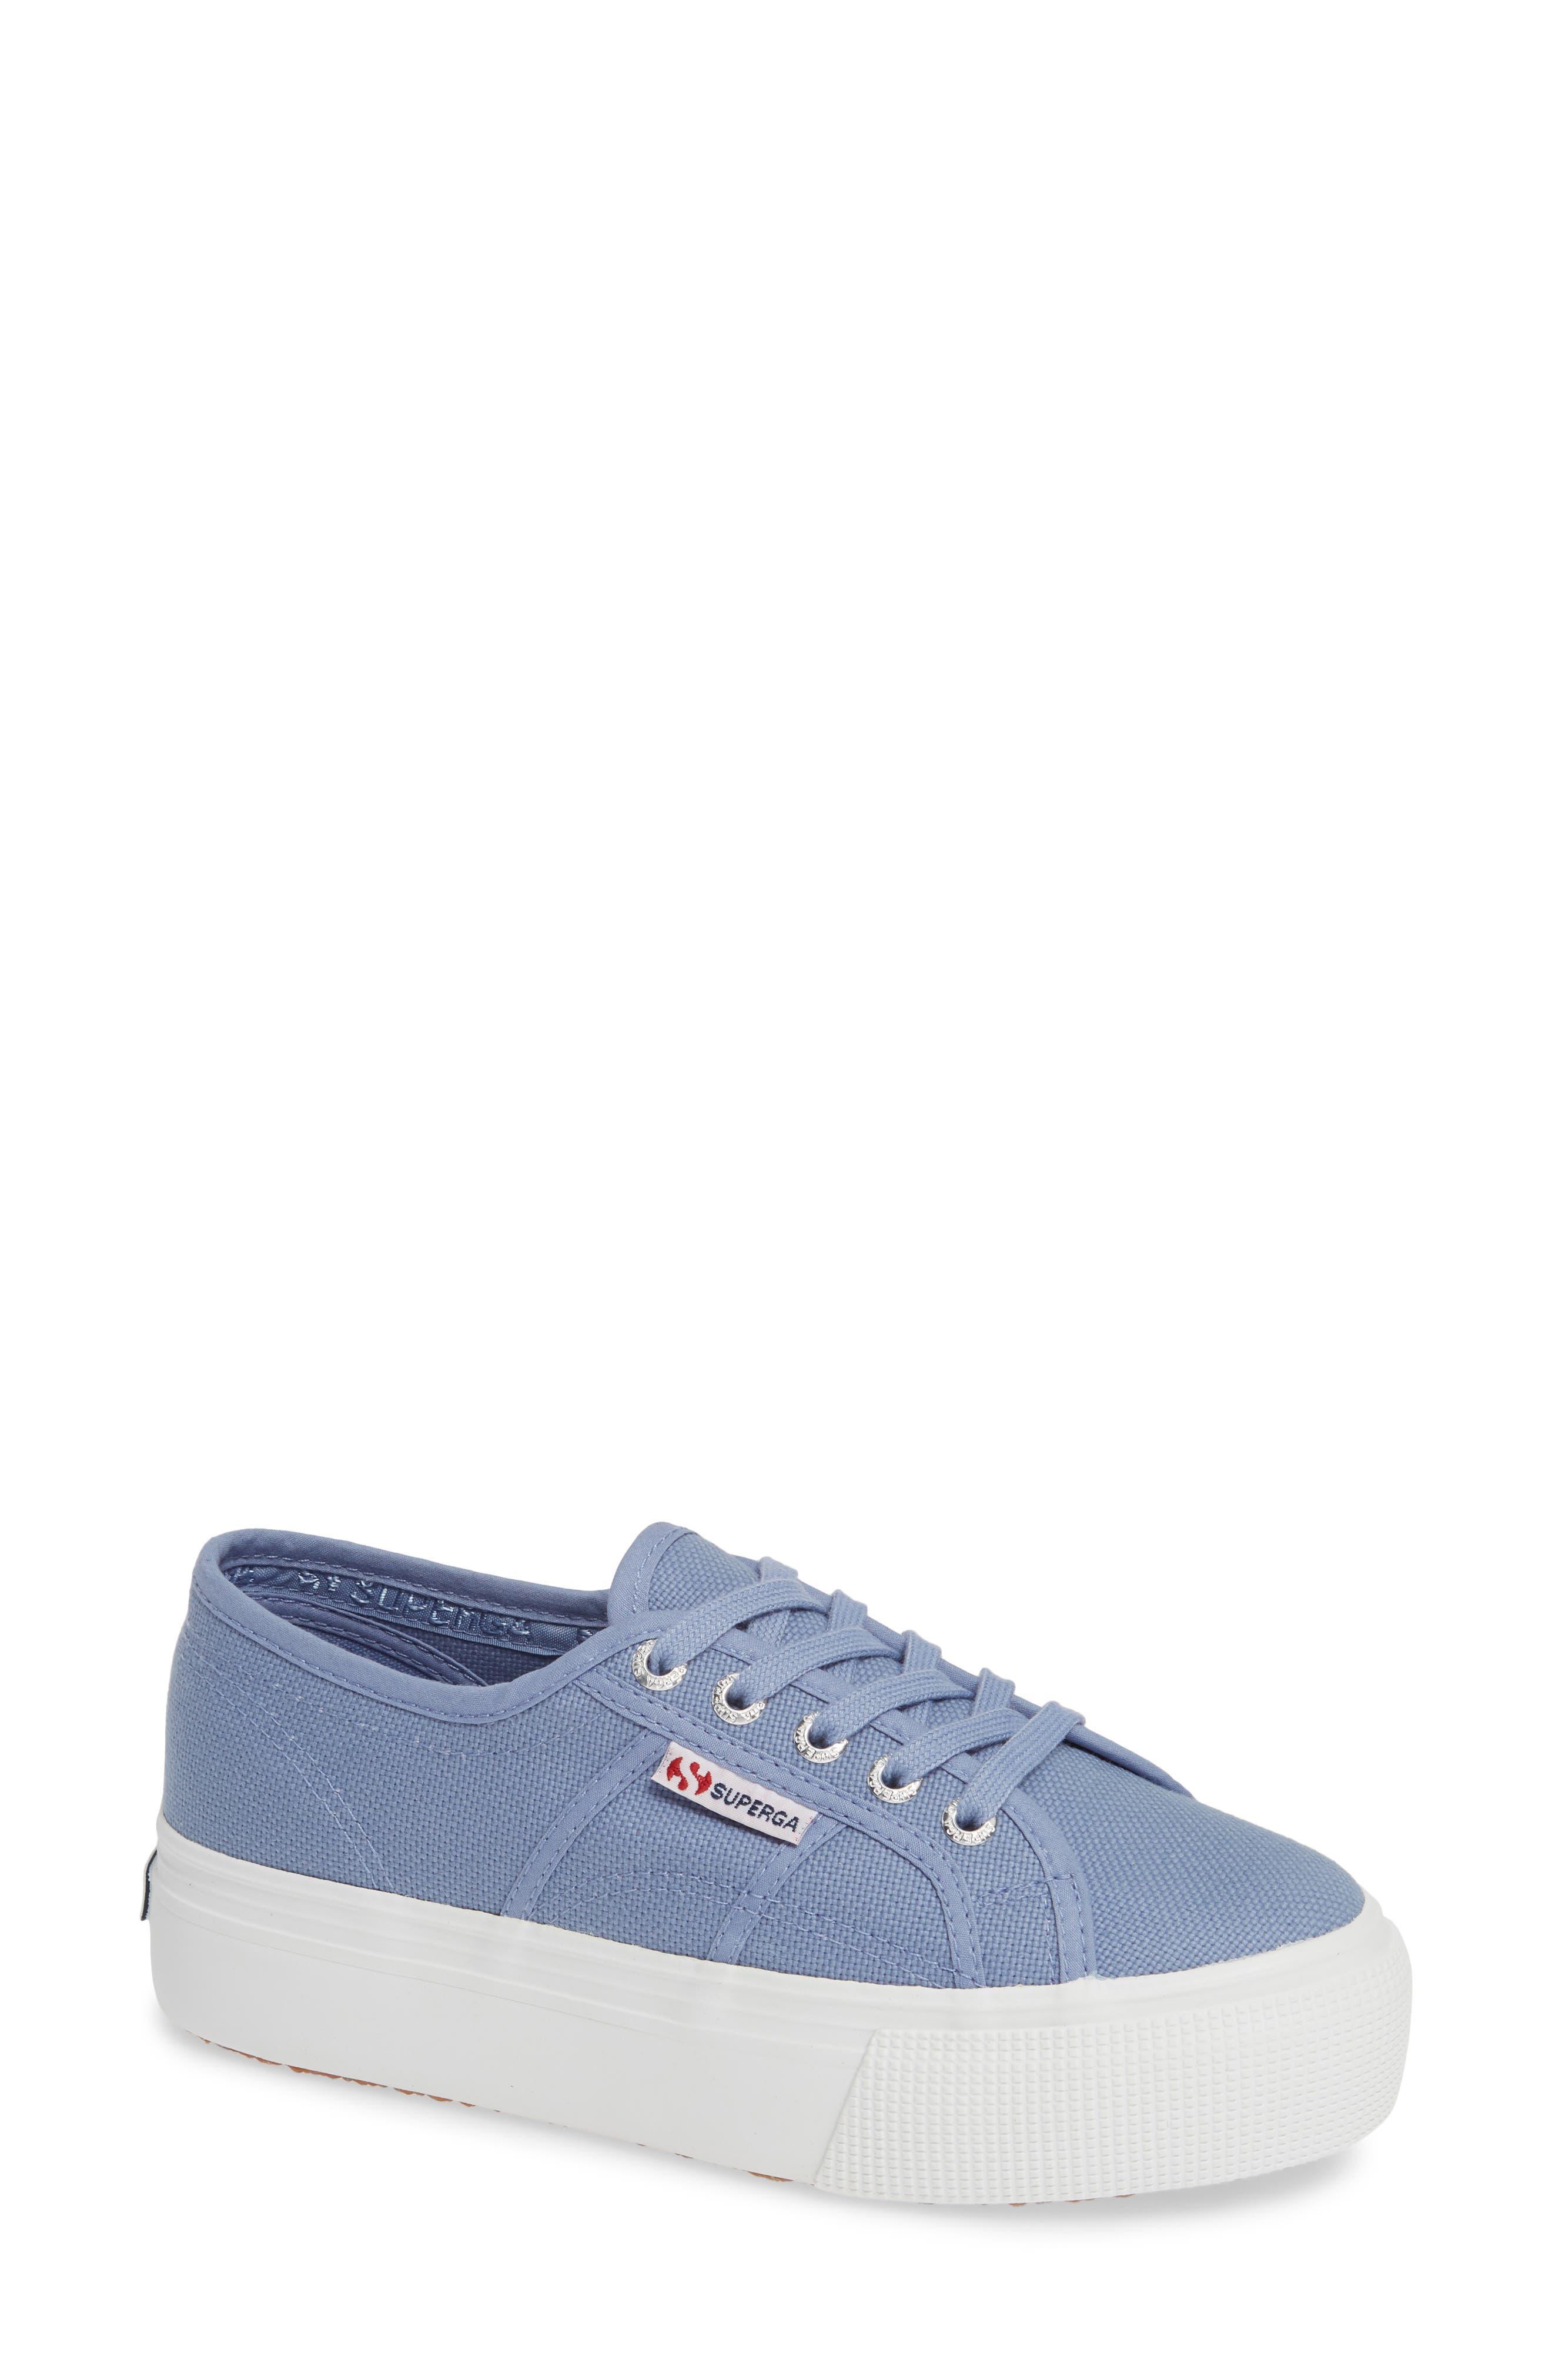 'Acot Linea' Sneaker,                             Main thumbnail 1, color,                             BLUE/ LIGHT PURPLE